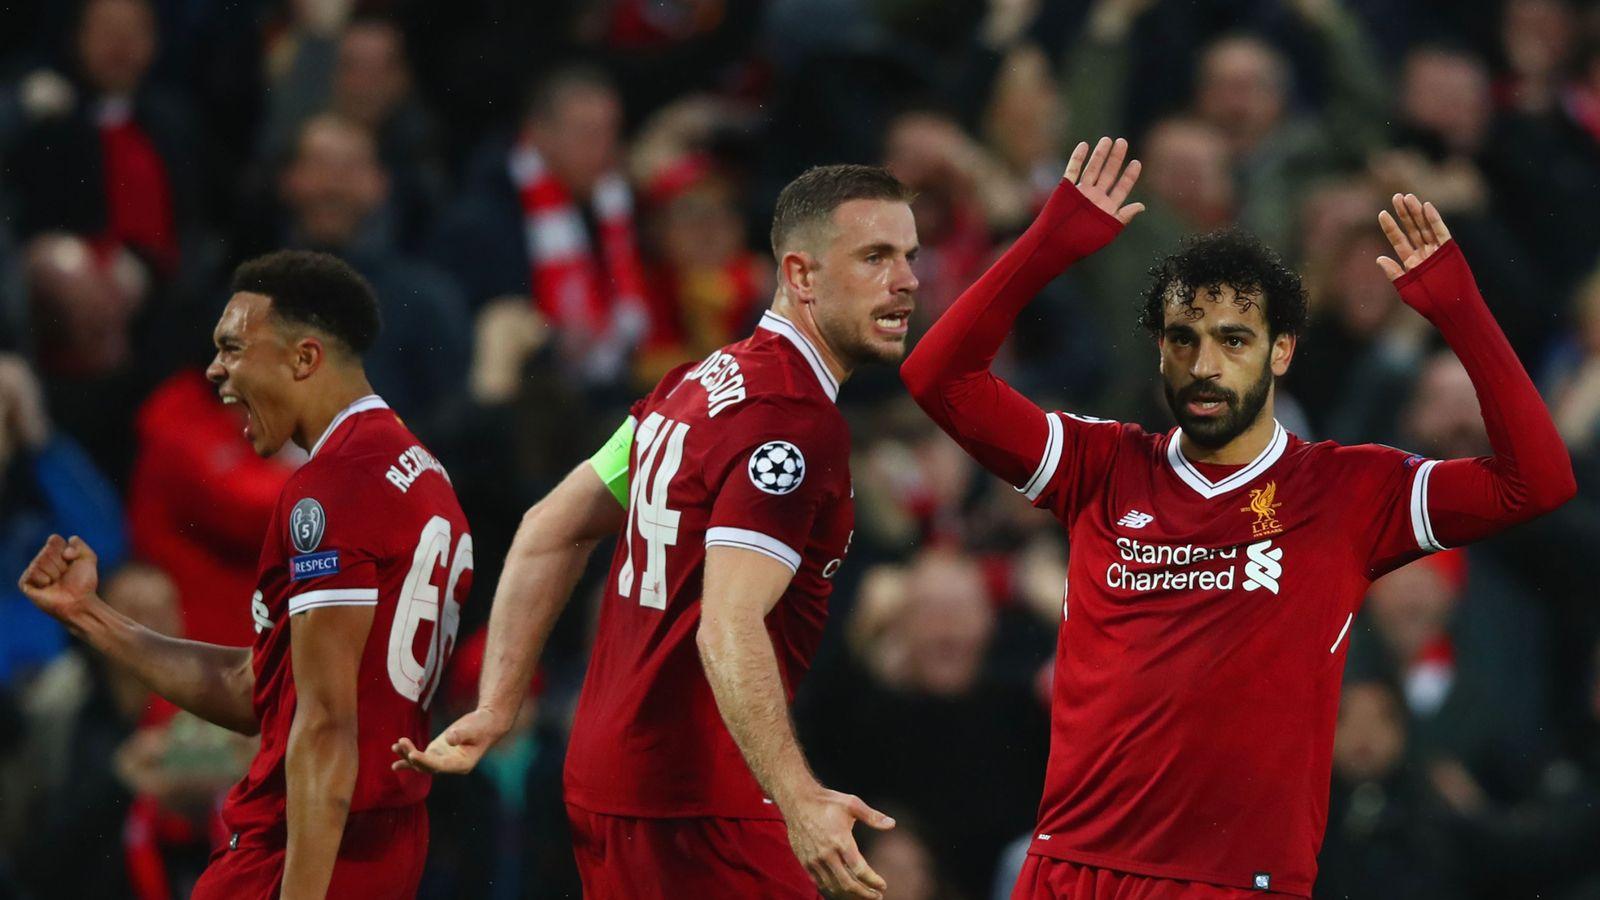 Liverpool 5 - 2 Roma - Match Report & Highlights